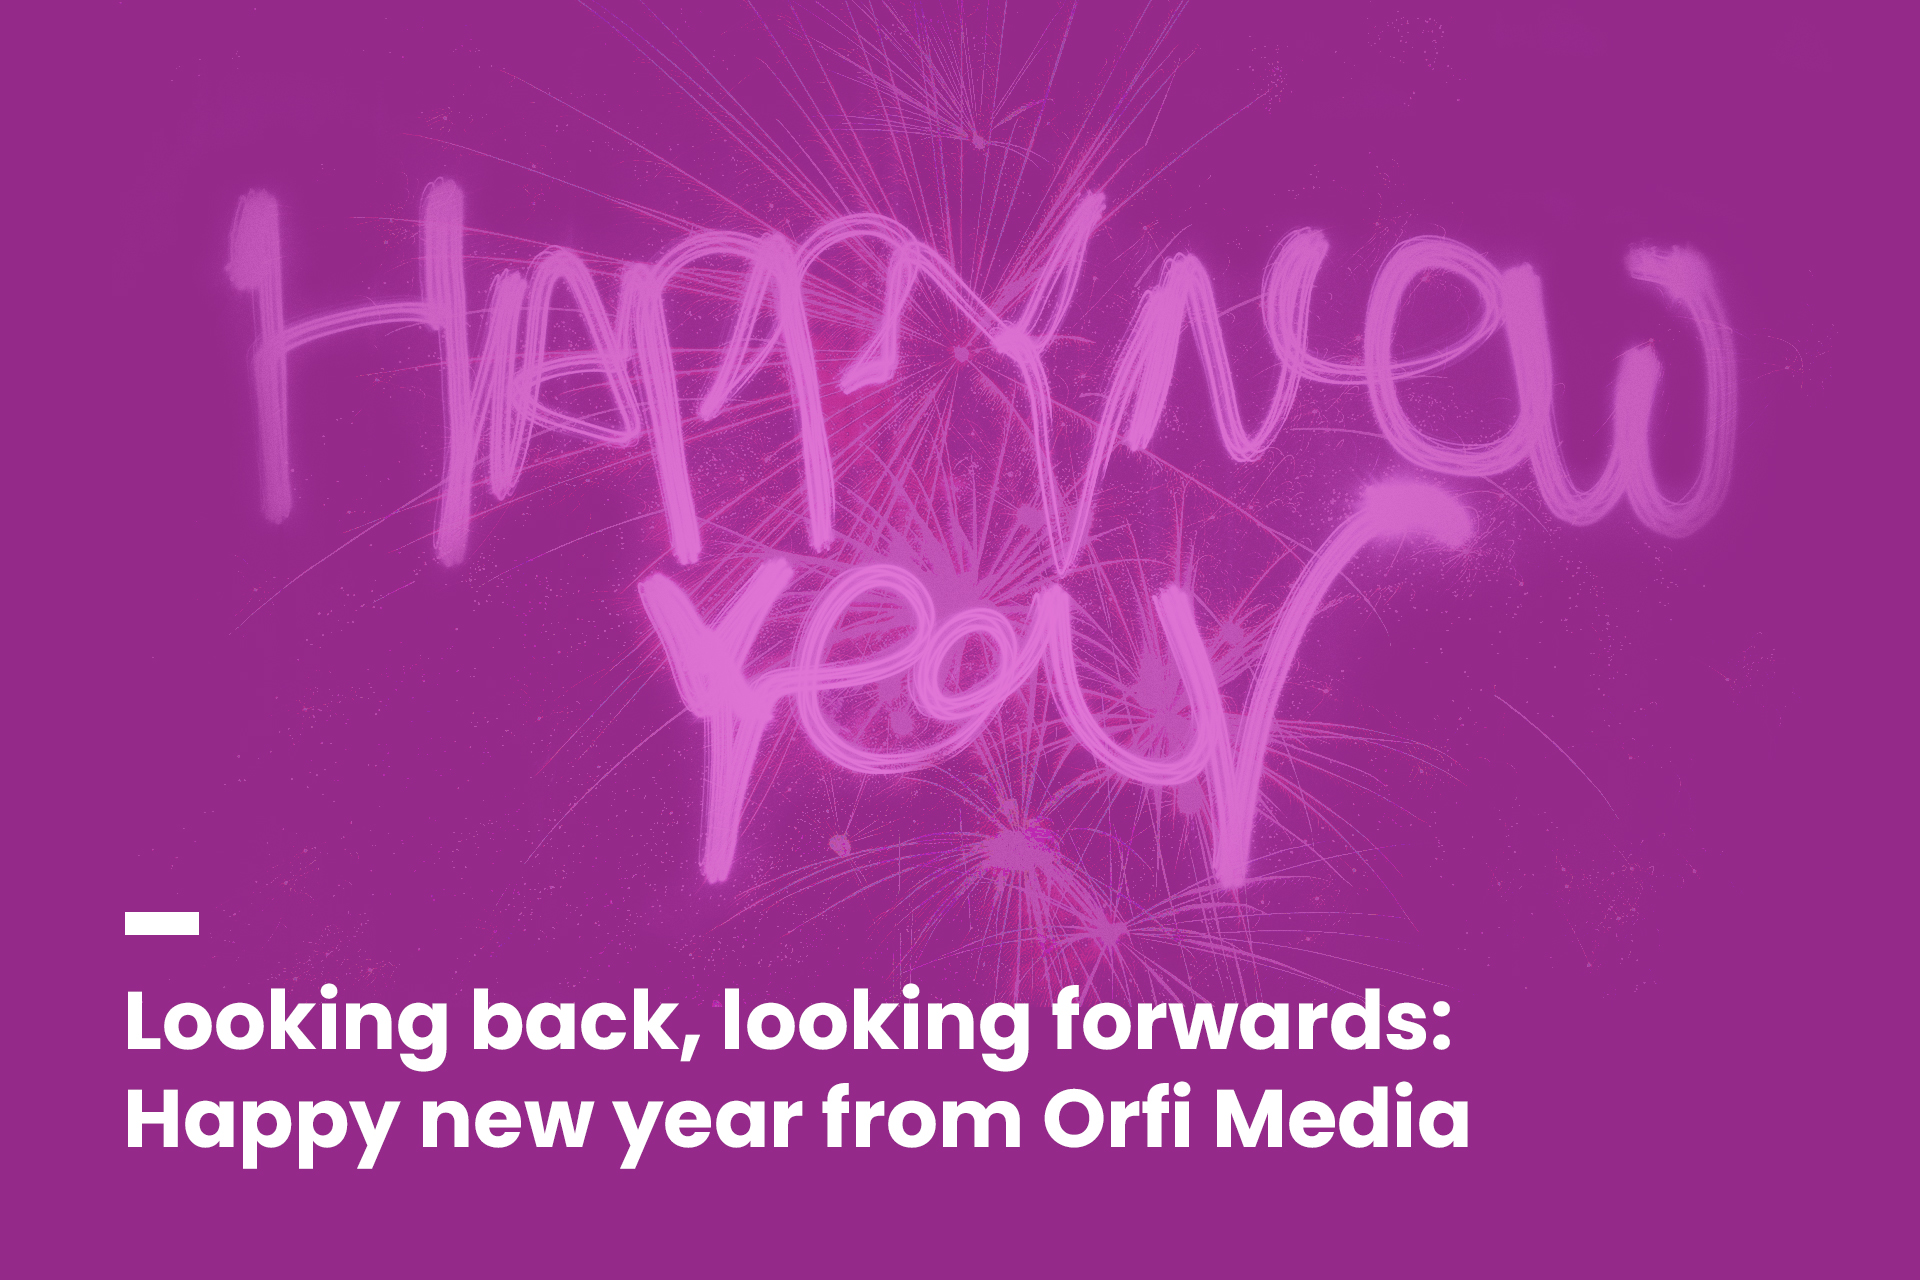 Happy new year from Orfi Media